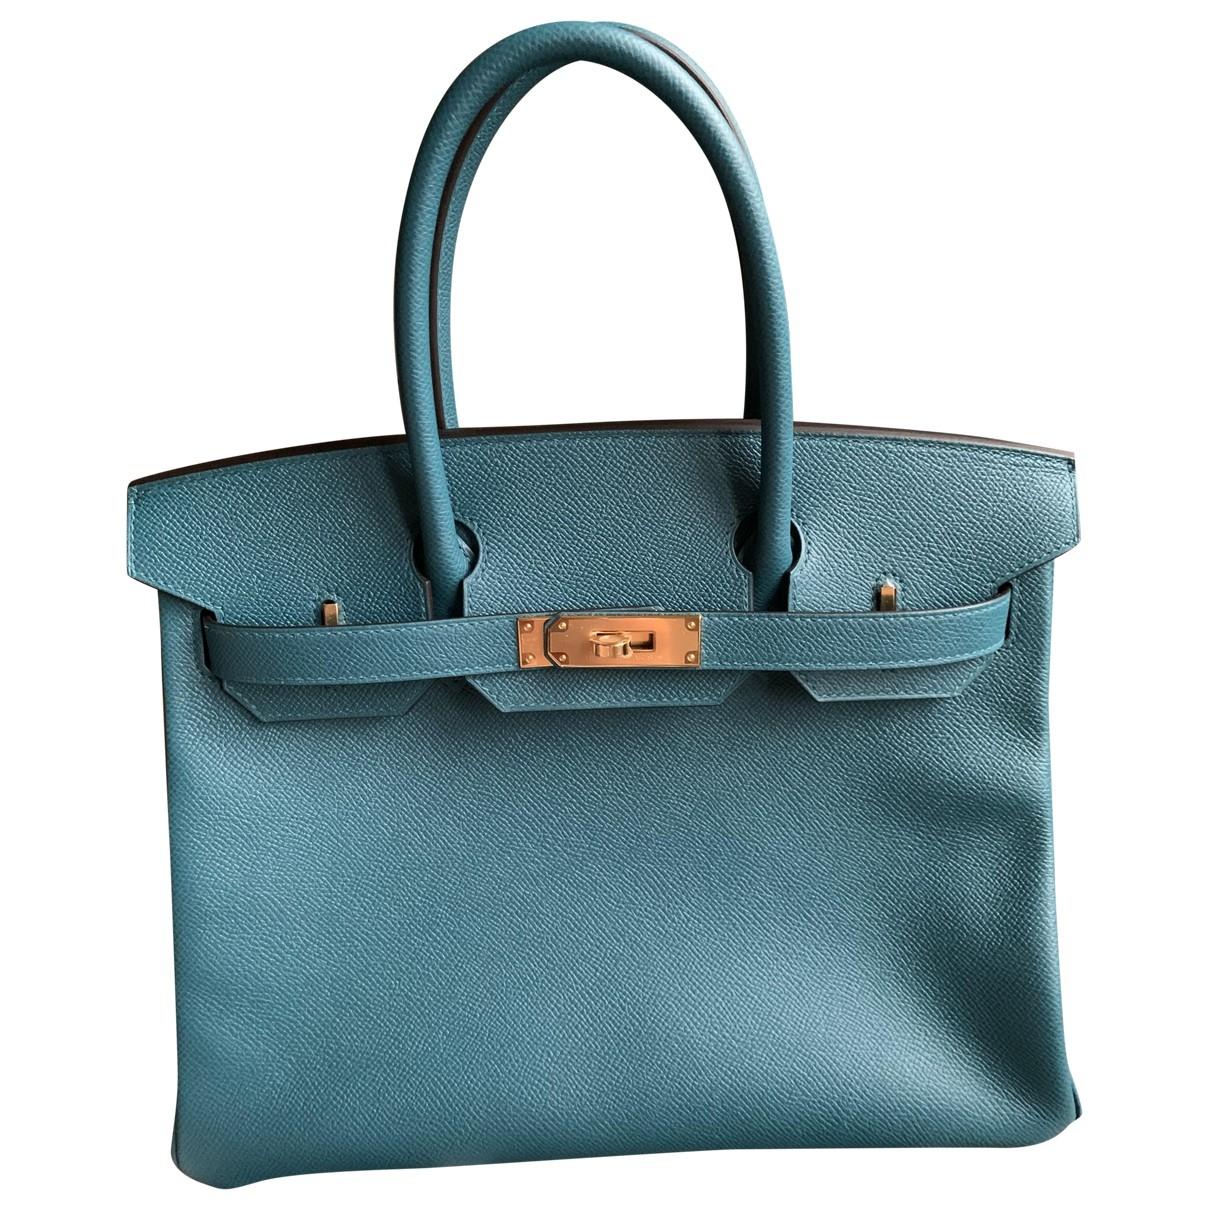 Hermes - Sac a main Birkin 30 pour femme en cuir - turquoise